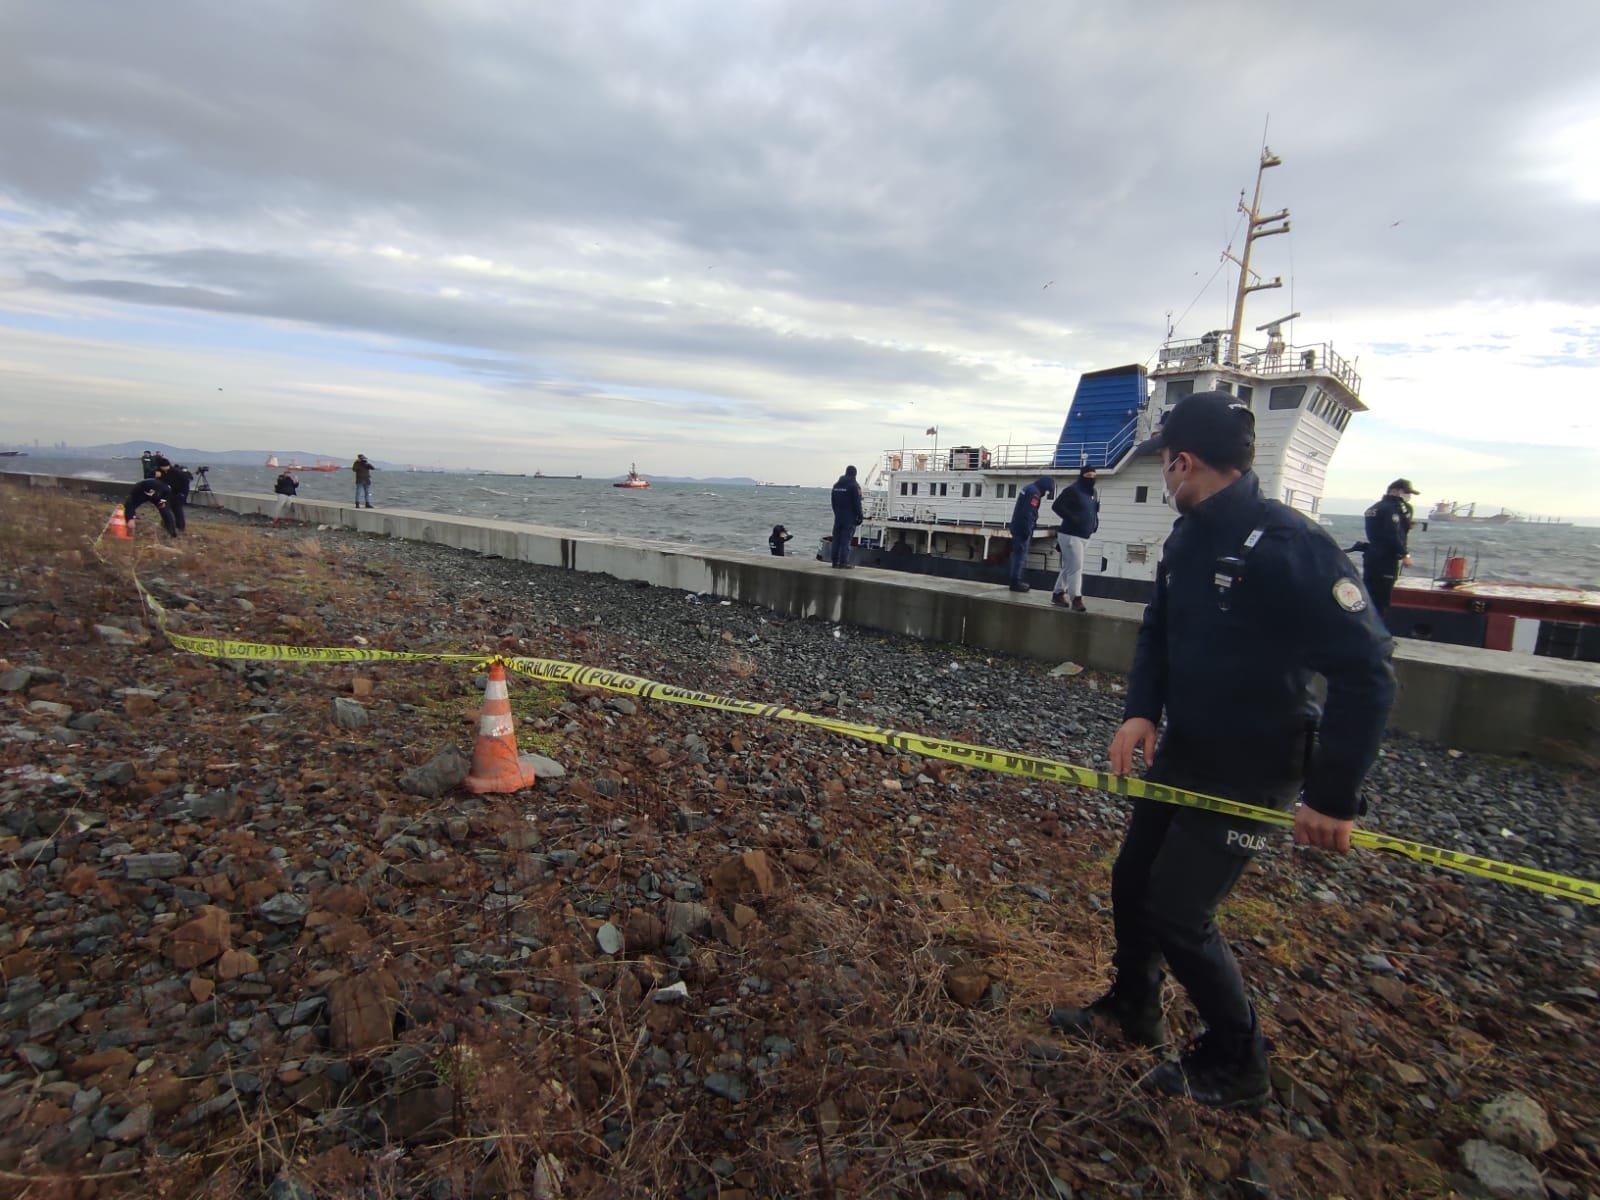 A cargo ship ran aground in the Marmara Sea in the Zeytinburnu district of Istanbul, Turkey, Jan. 29, 2021. (DHA Photo)